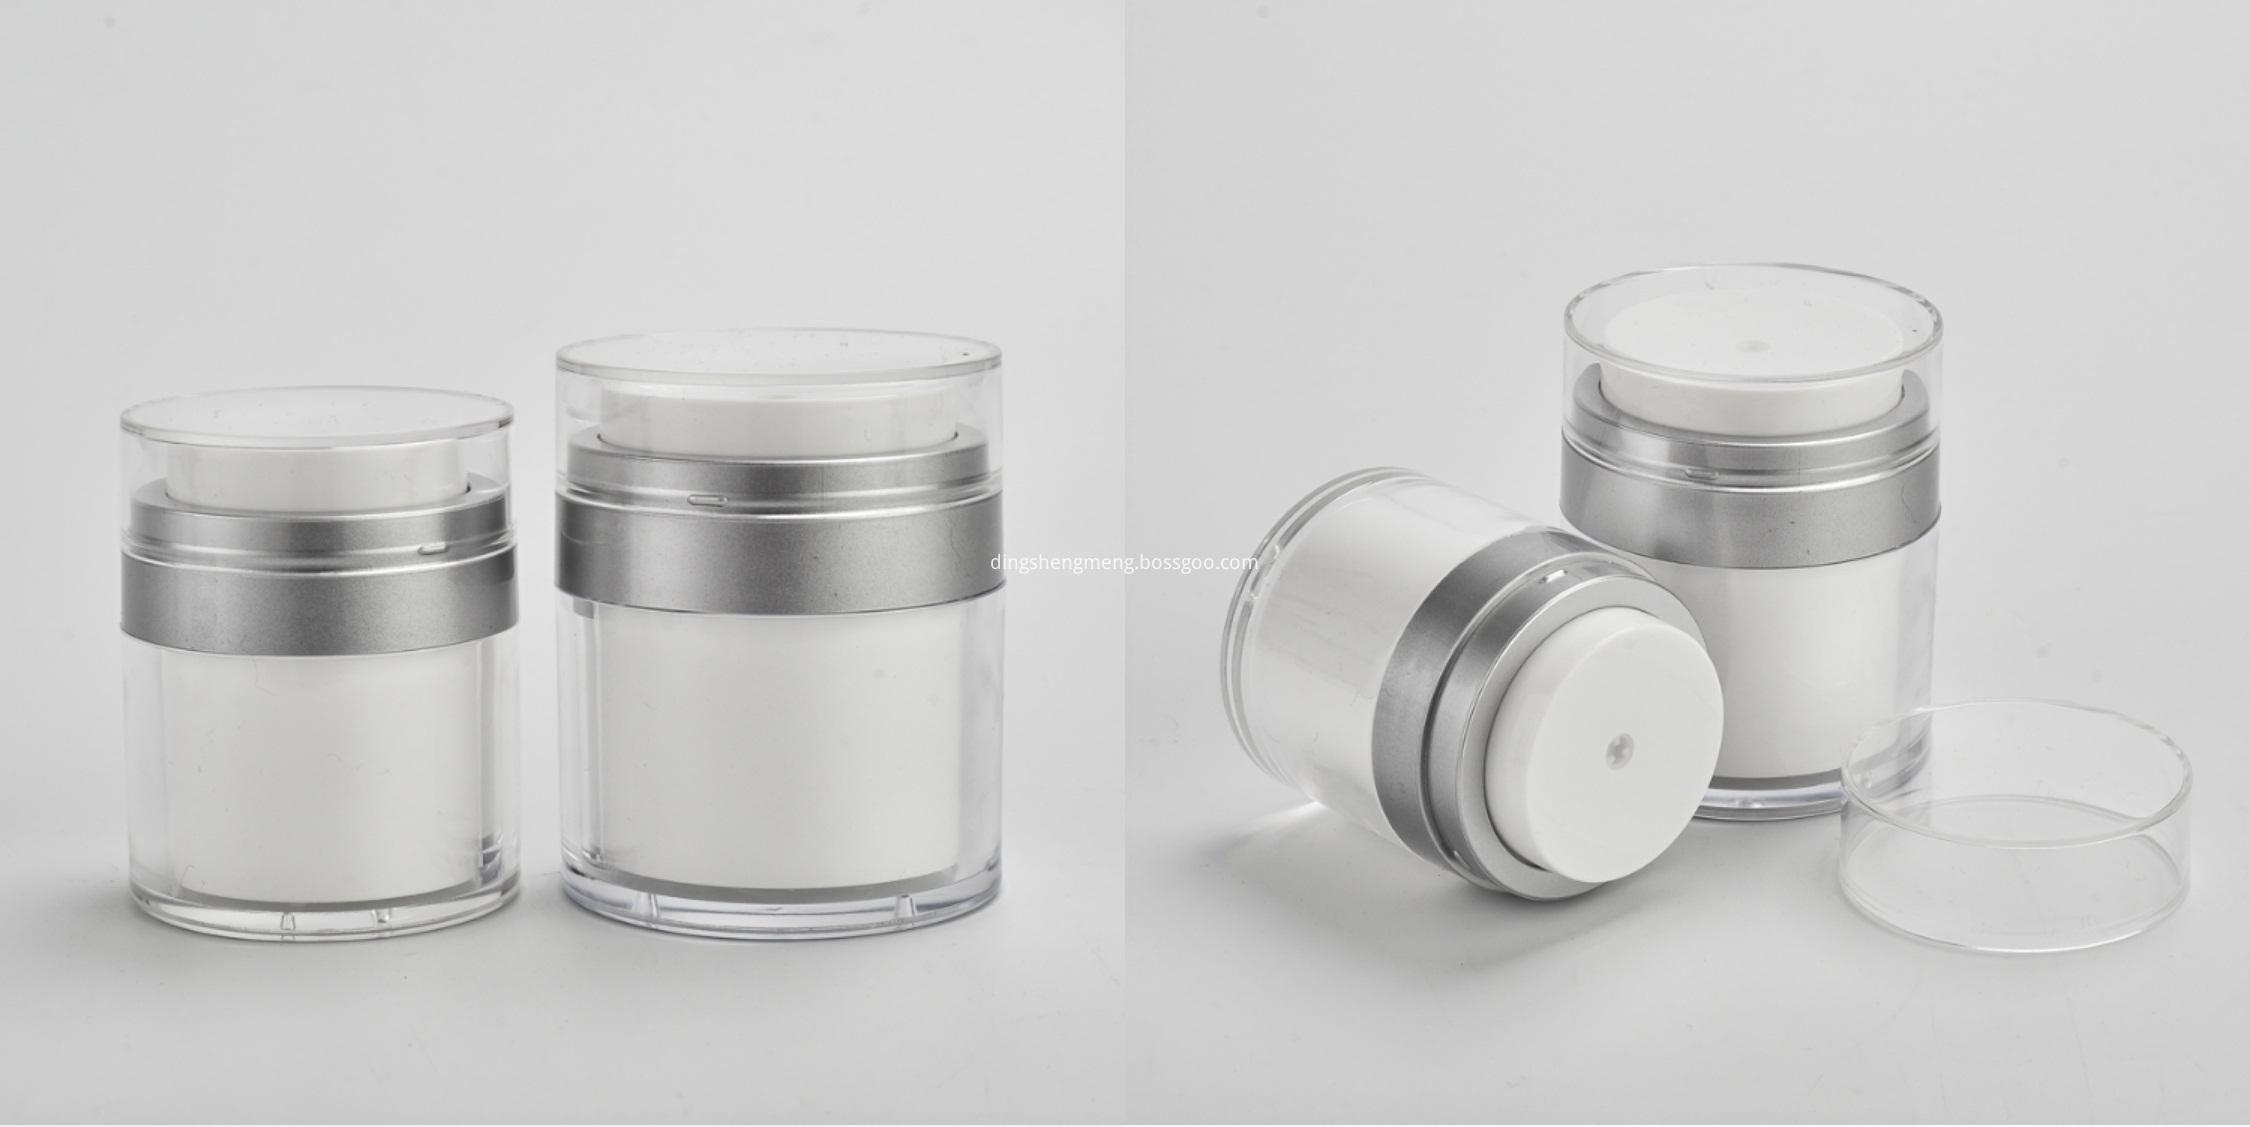 Airless Cosmetic Jar